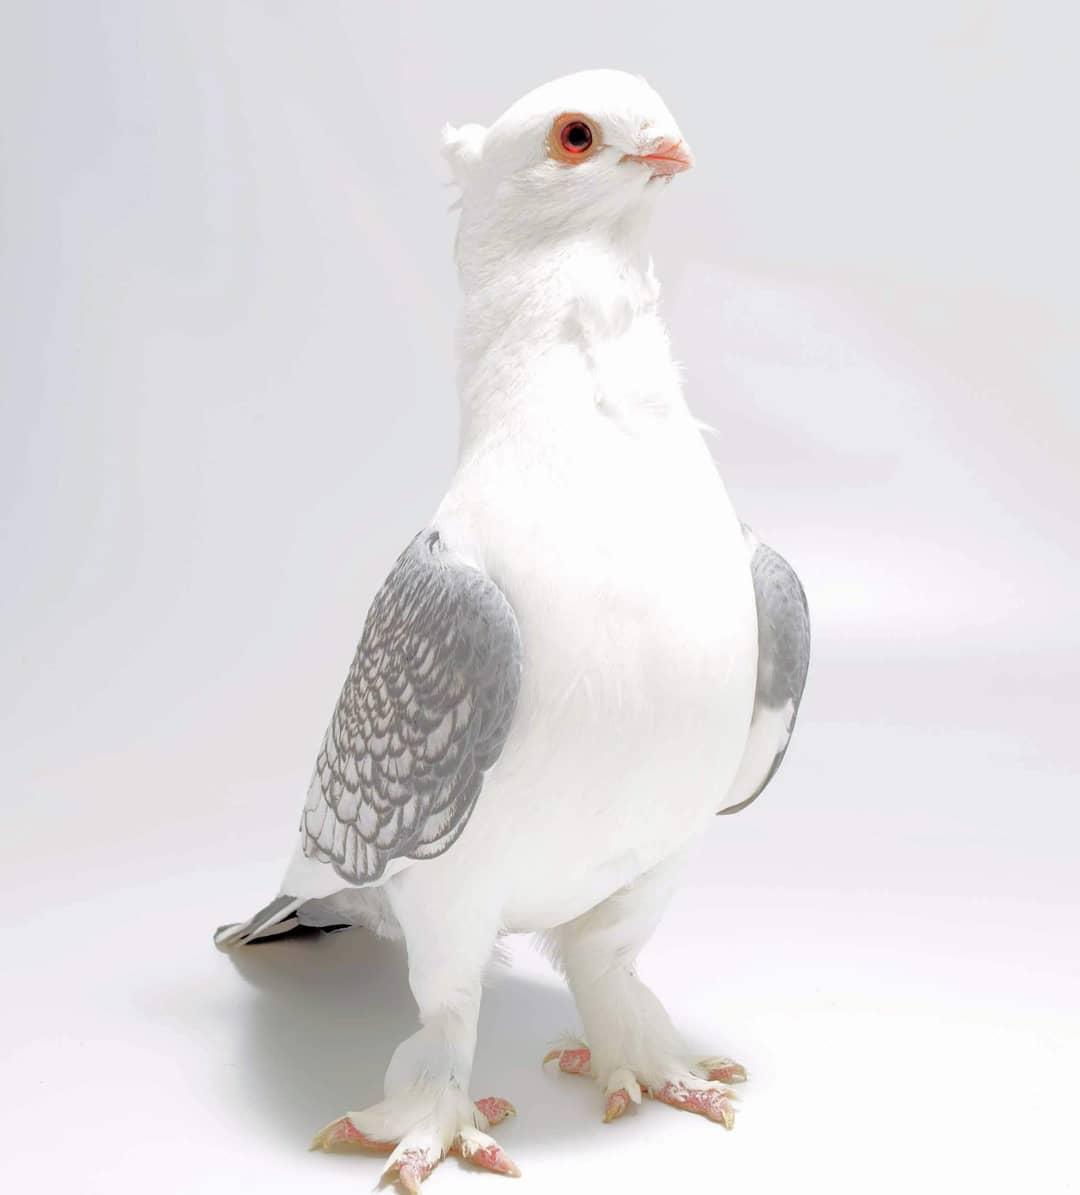 Unduh 77+  Gambar Burung Merpati Unik HD